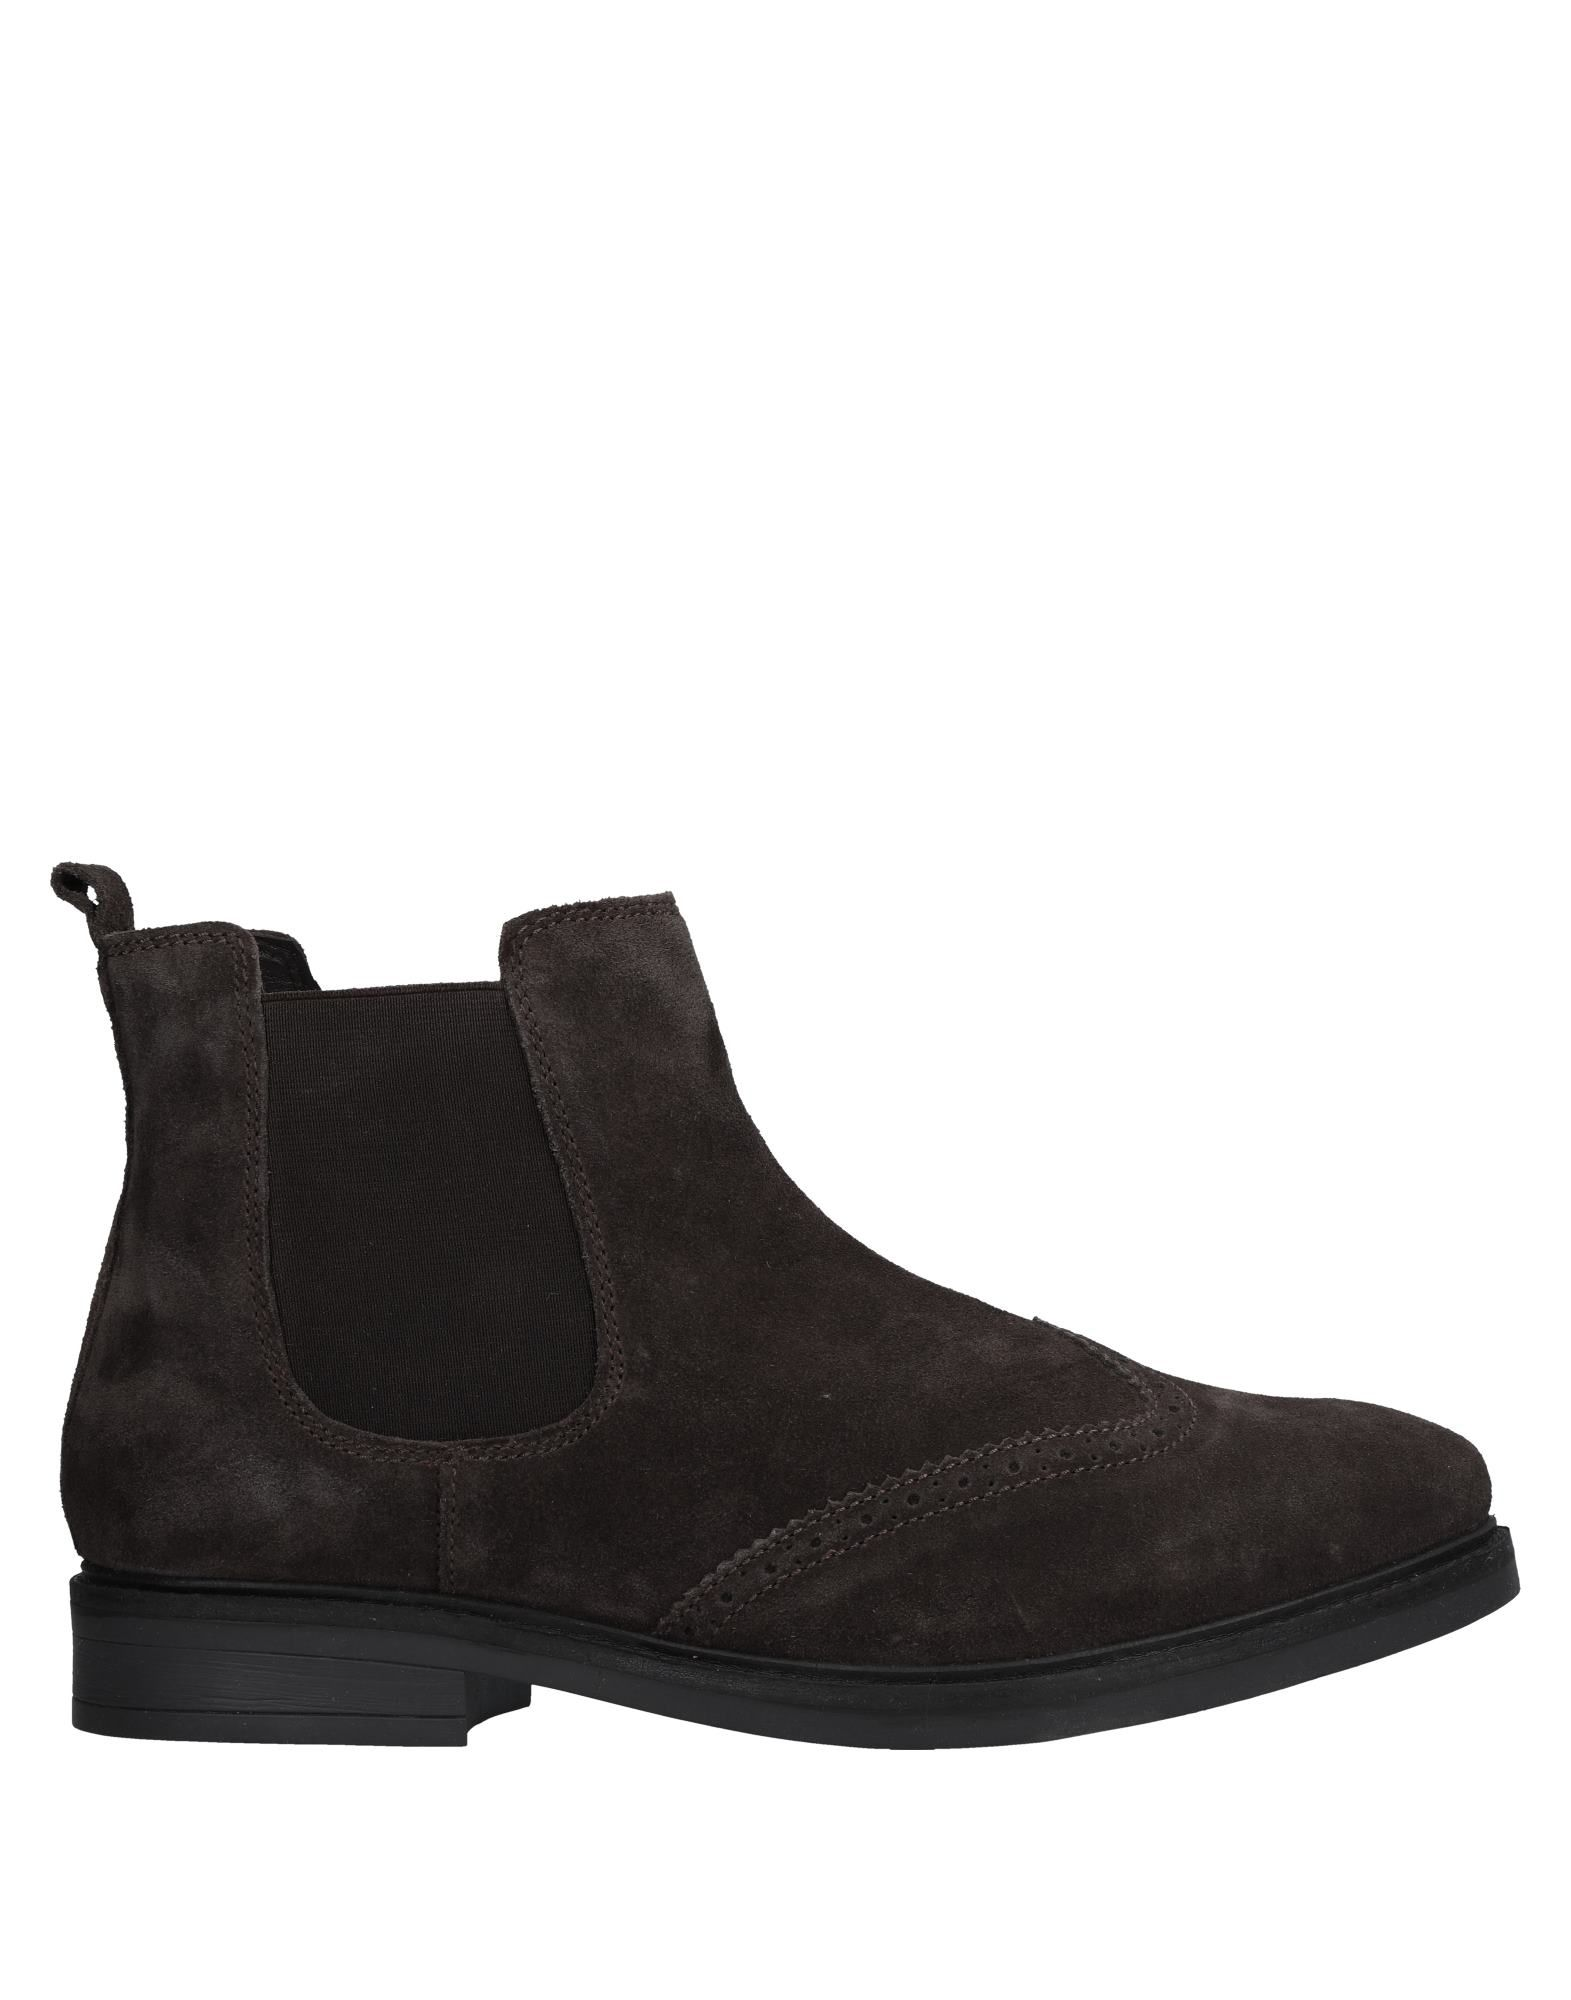 Lumberjack Stiefelette Schuhe Herren  11514583KA Heiße Schuhe Stiefelette af5ee2